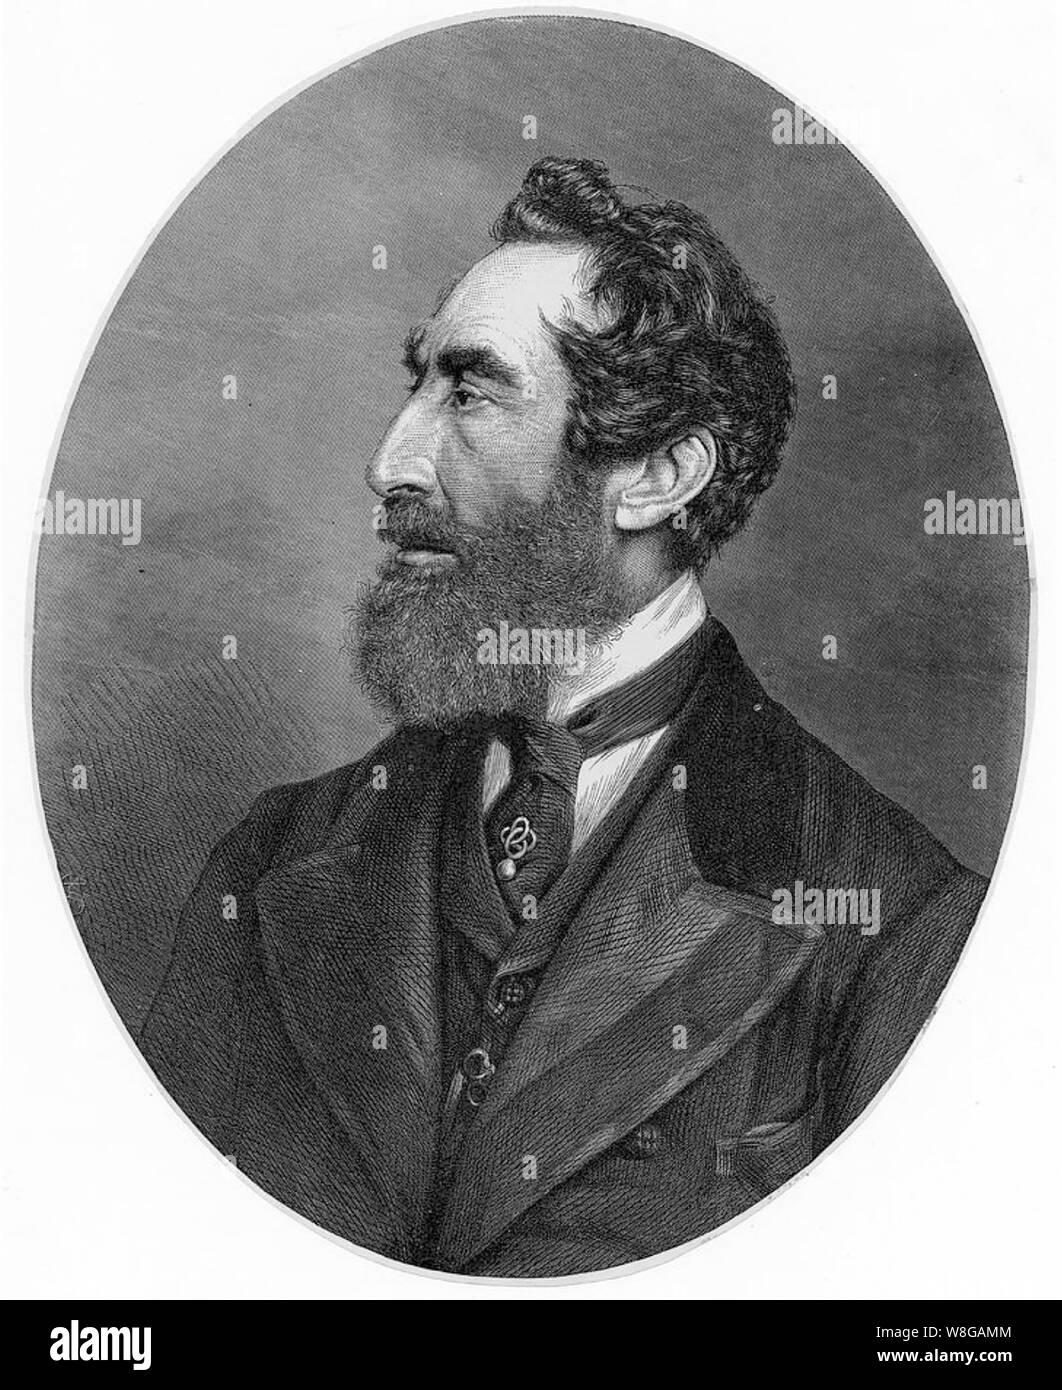 EDWARD BULWER-LYTTON (1803-18973) English writer and politician Stock Photo